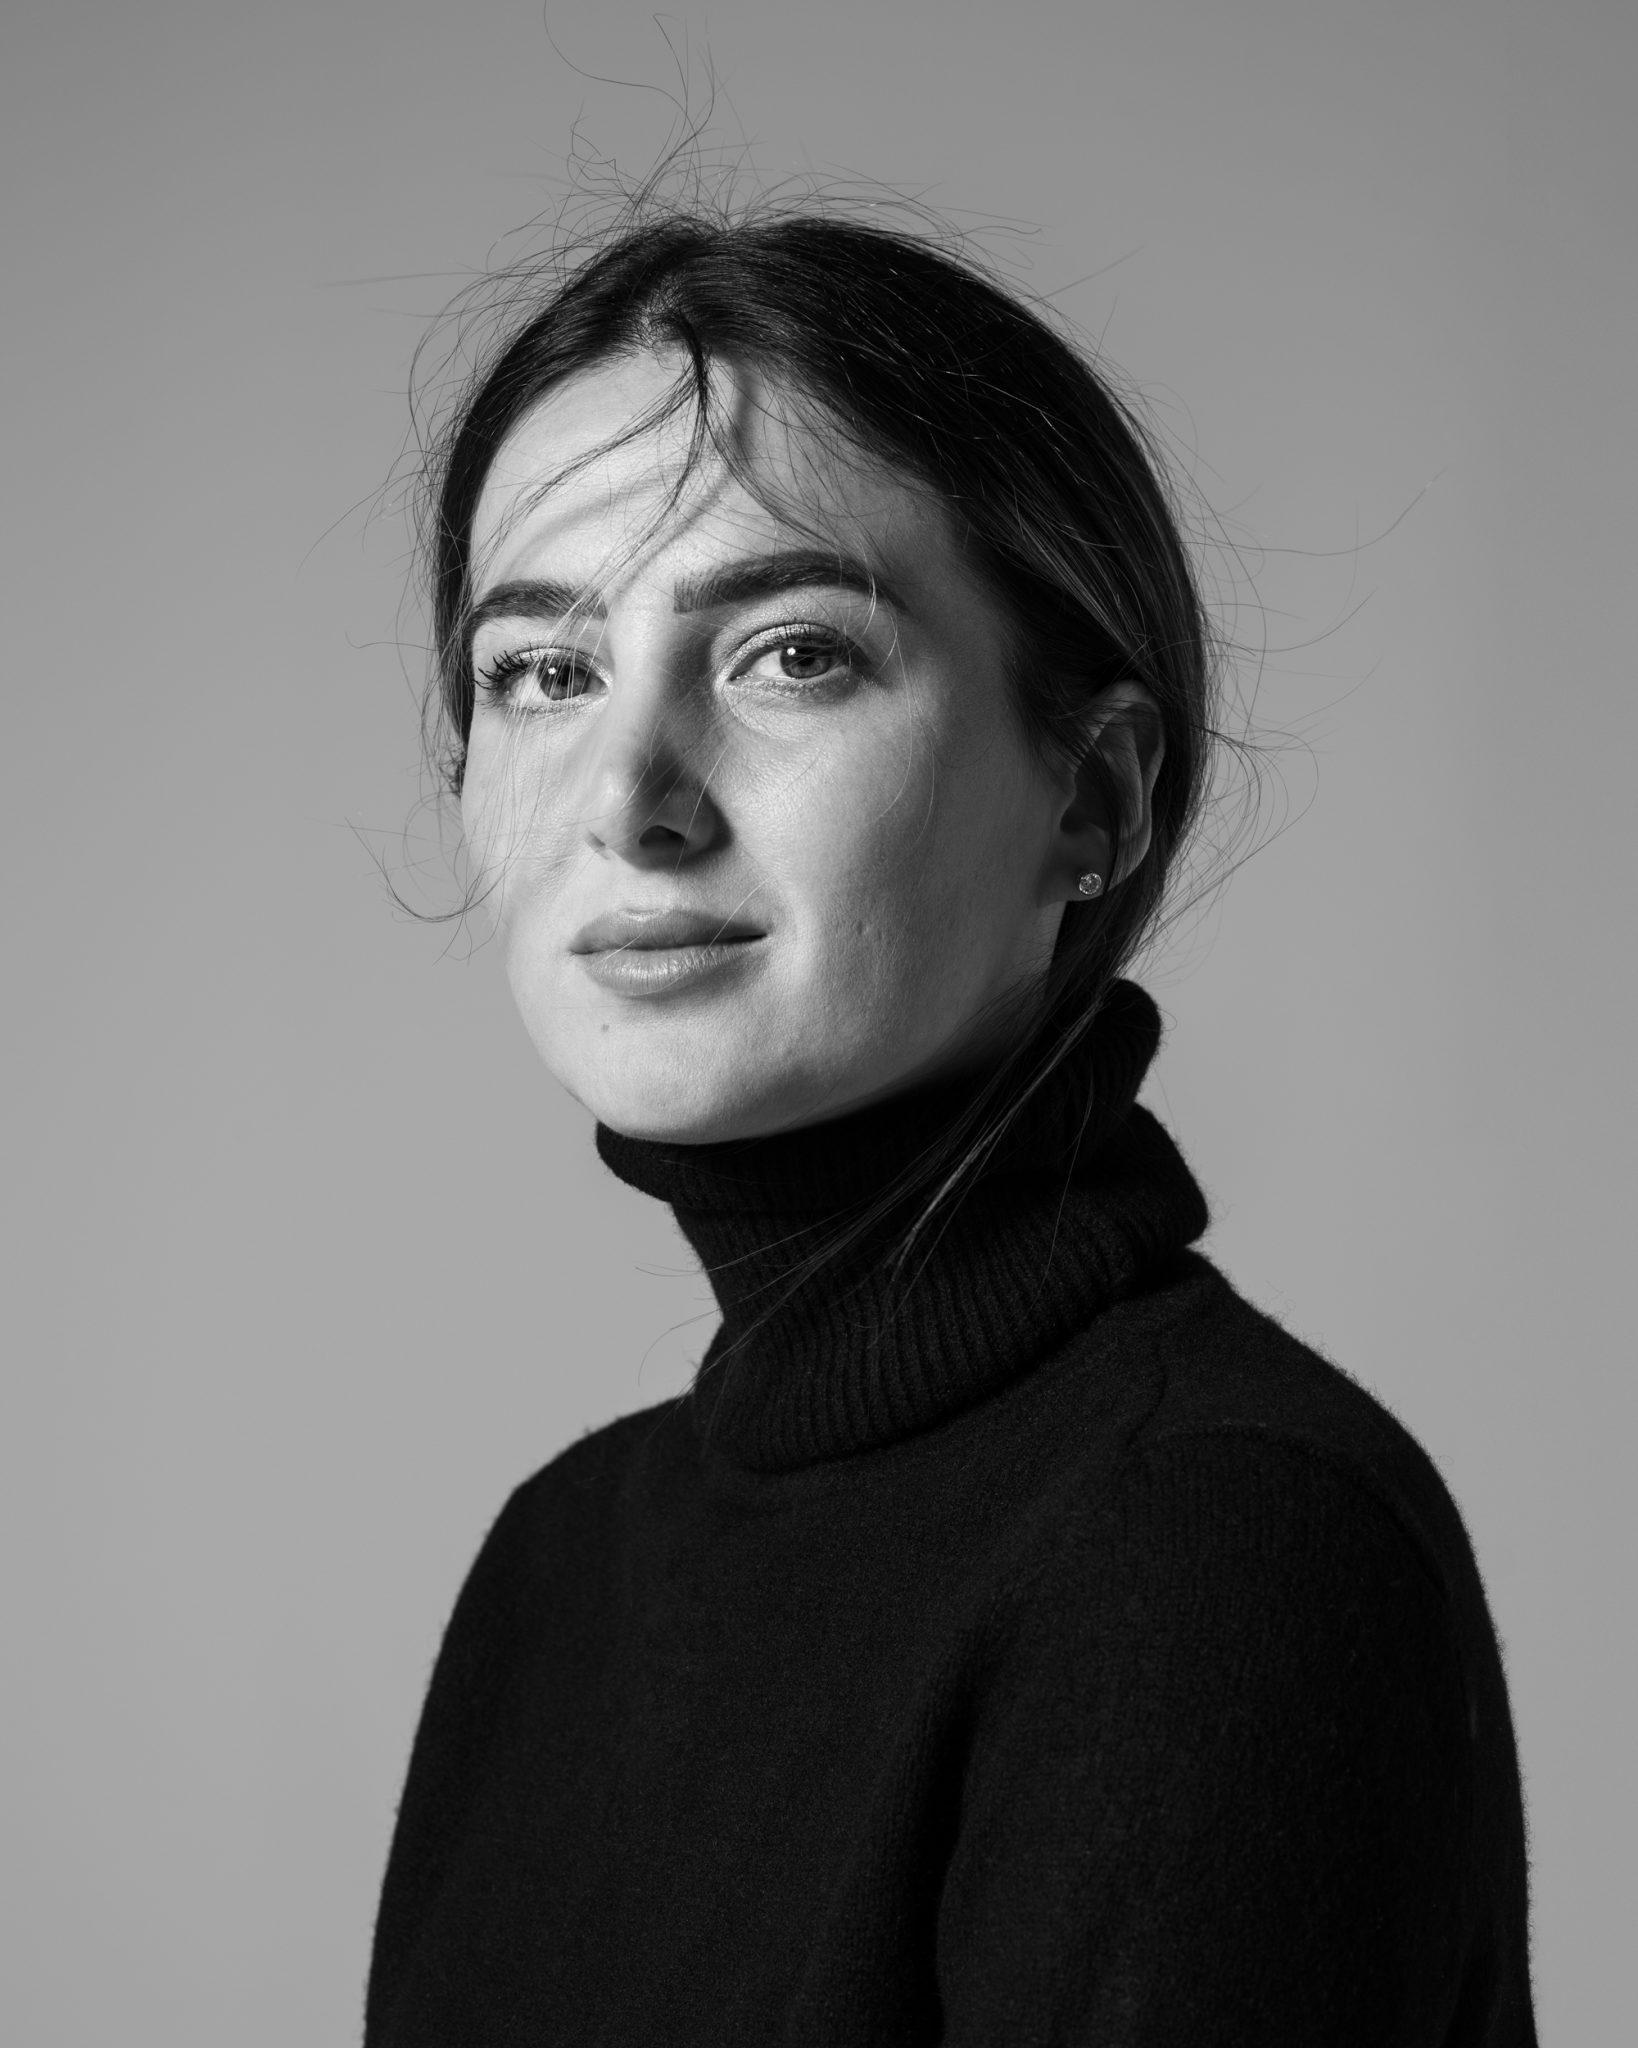 Lejla Ibisevic Robin de Puy